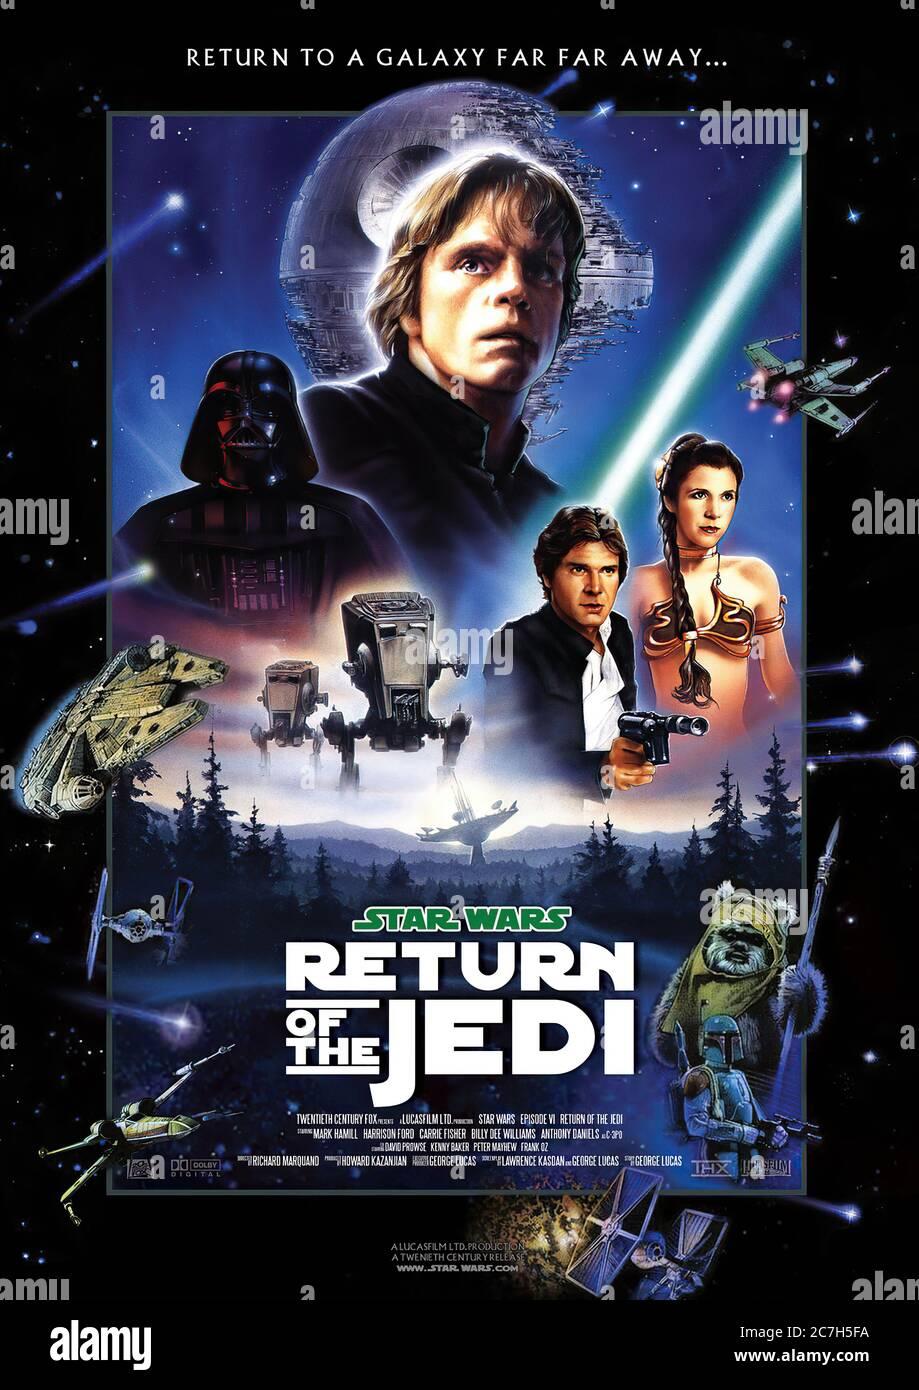 https www alamy com return of the jedi movie poster image366097854 html